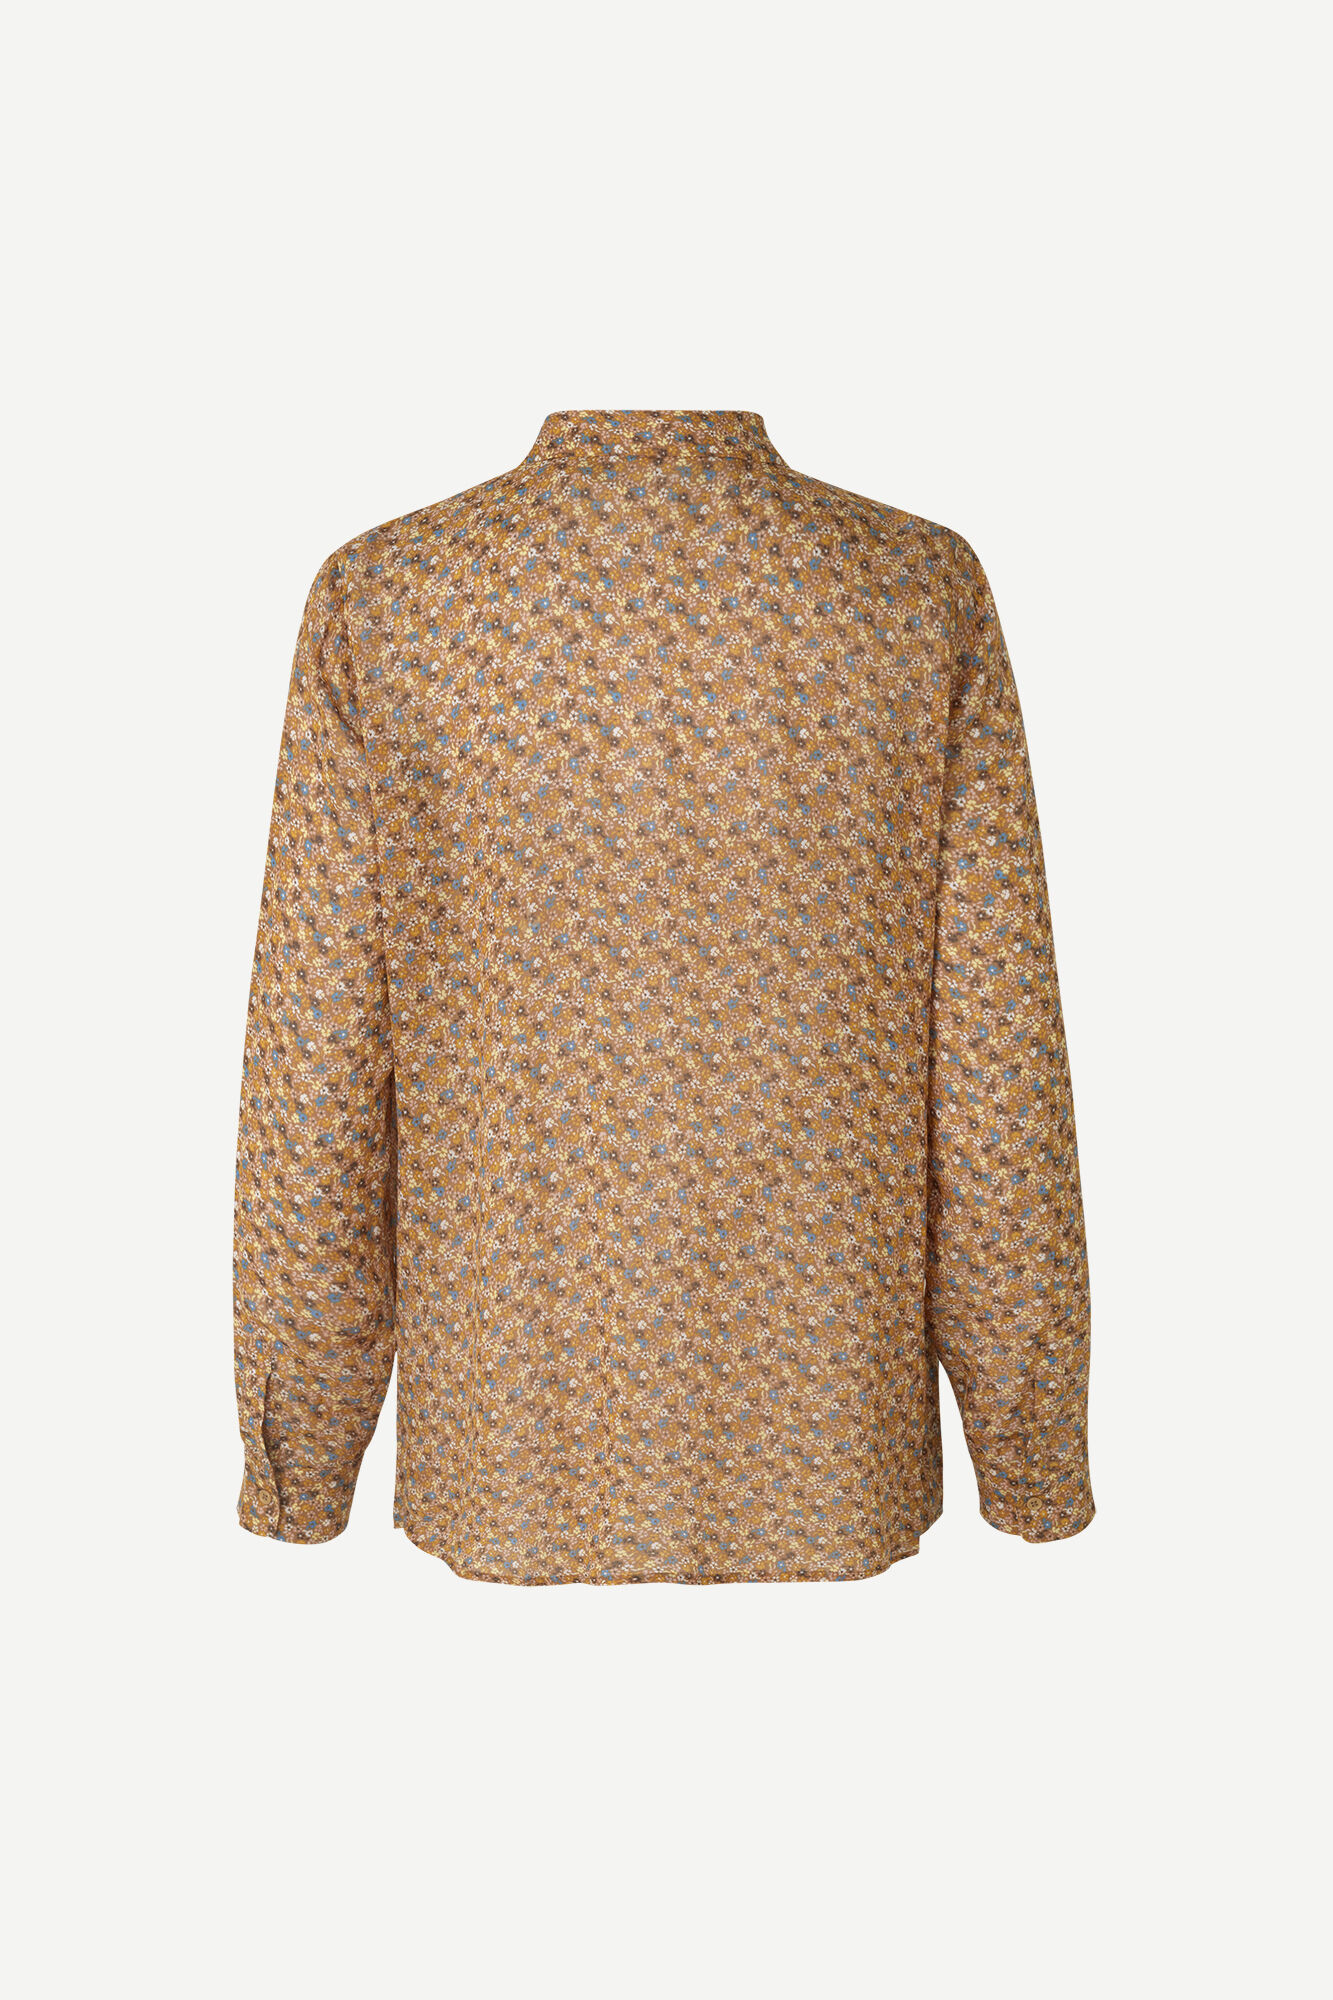 Milly shirt aop 9695